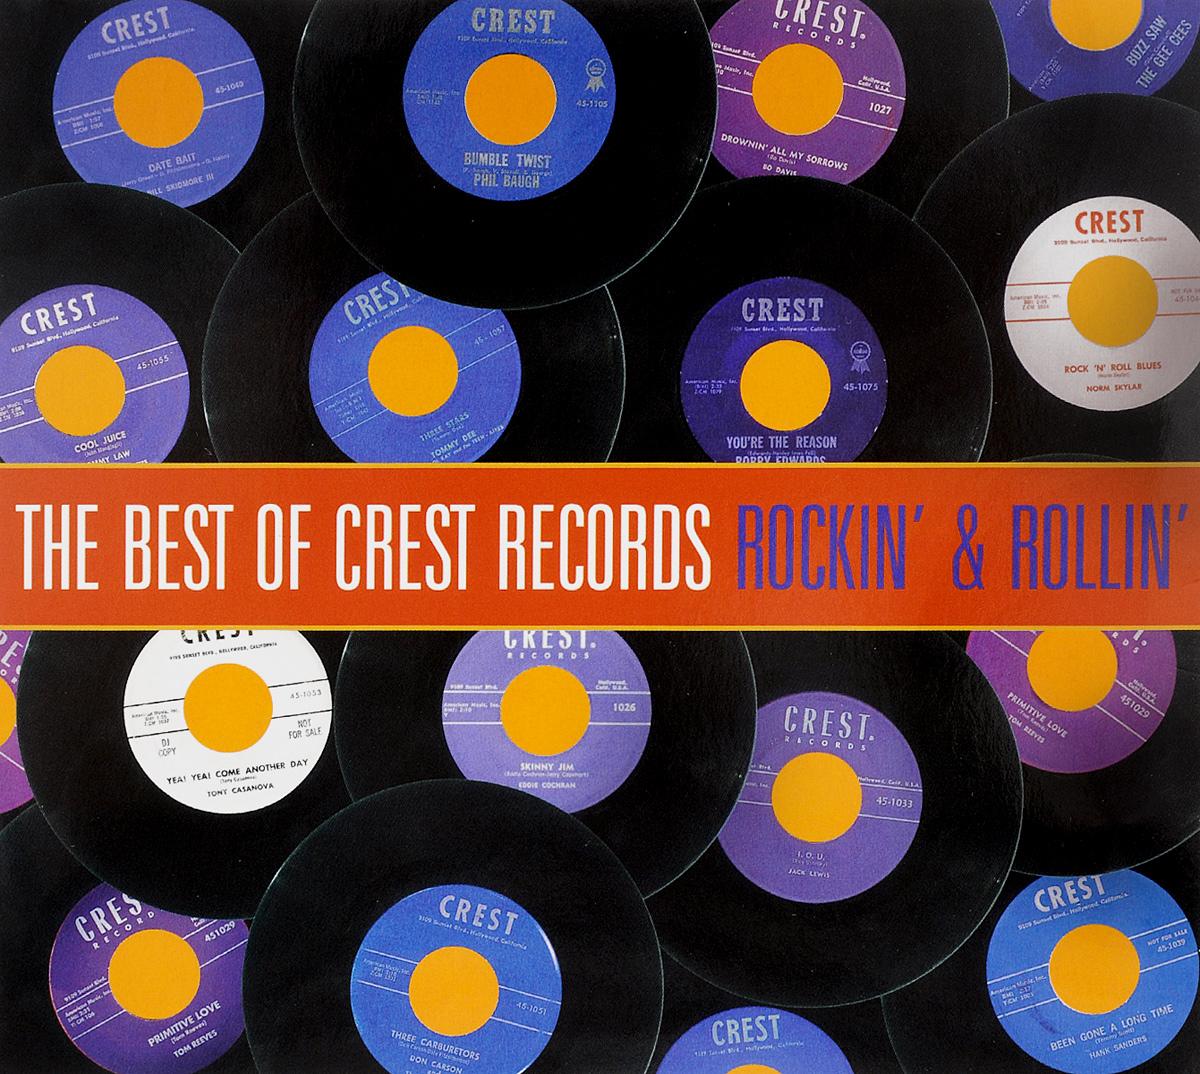 The Best Of Crest Records. Rockin' & Rollin' crest 200g